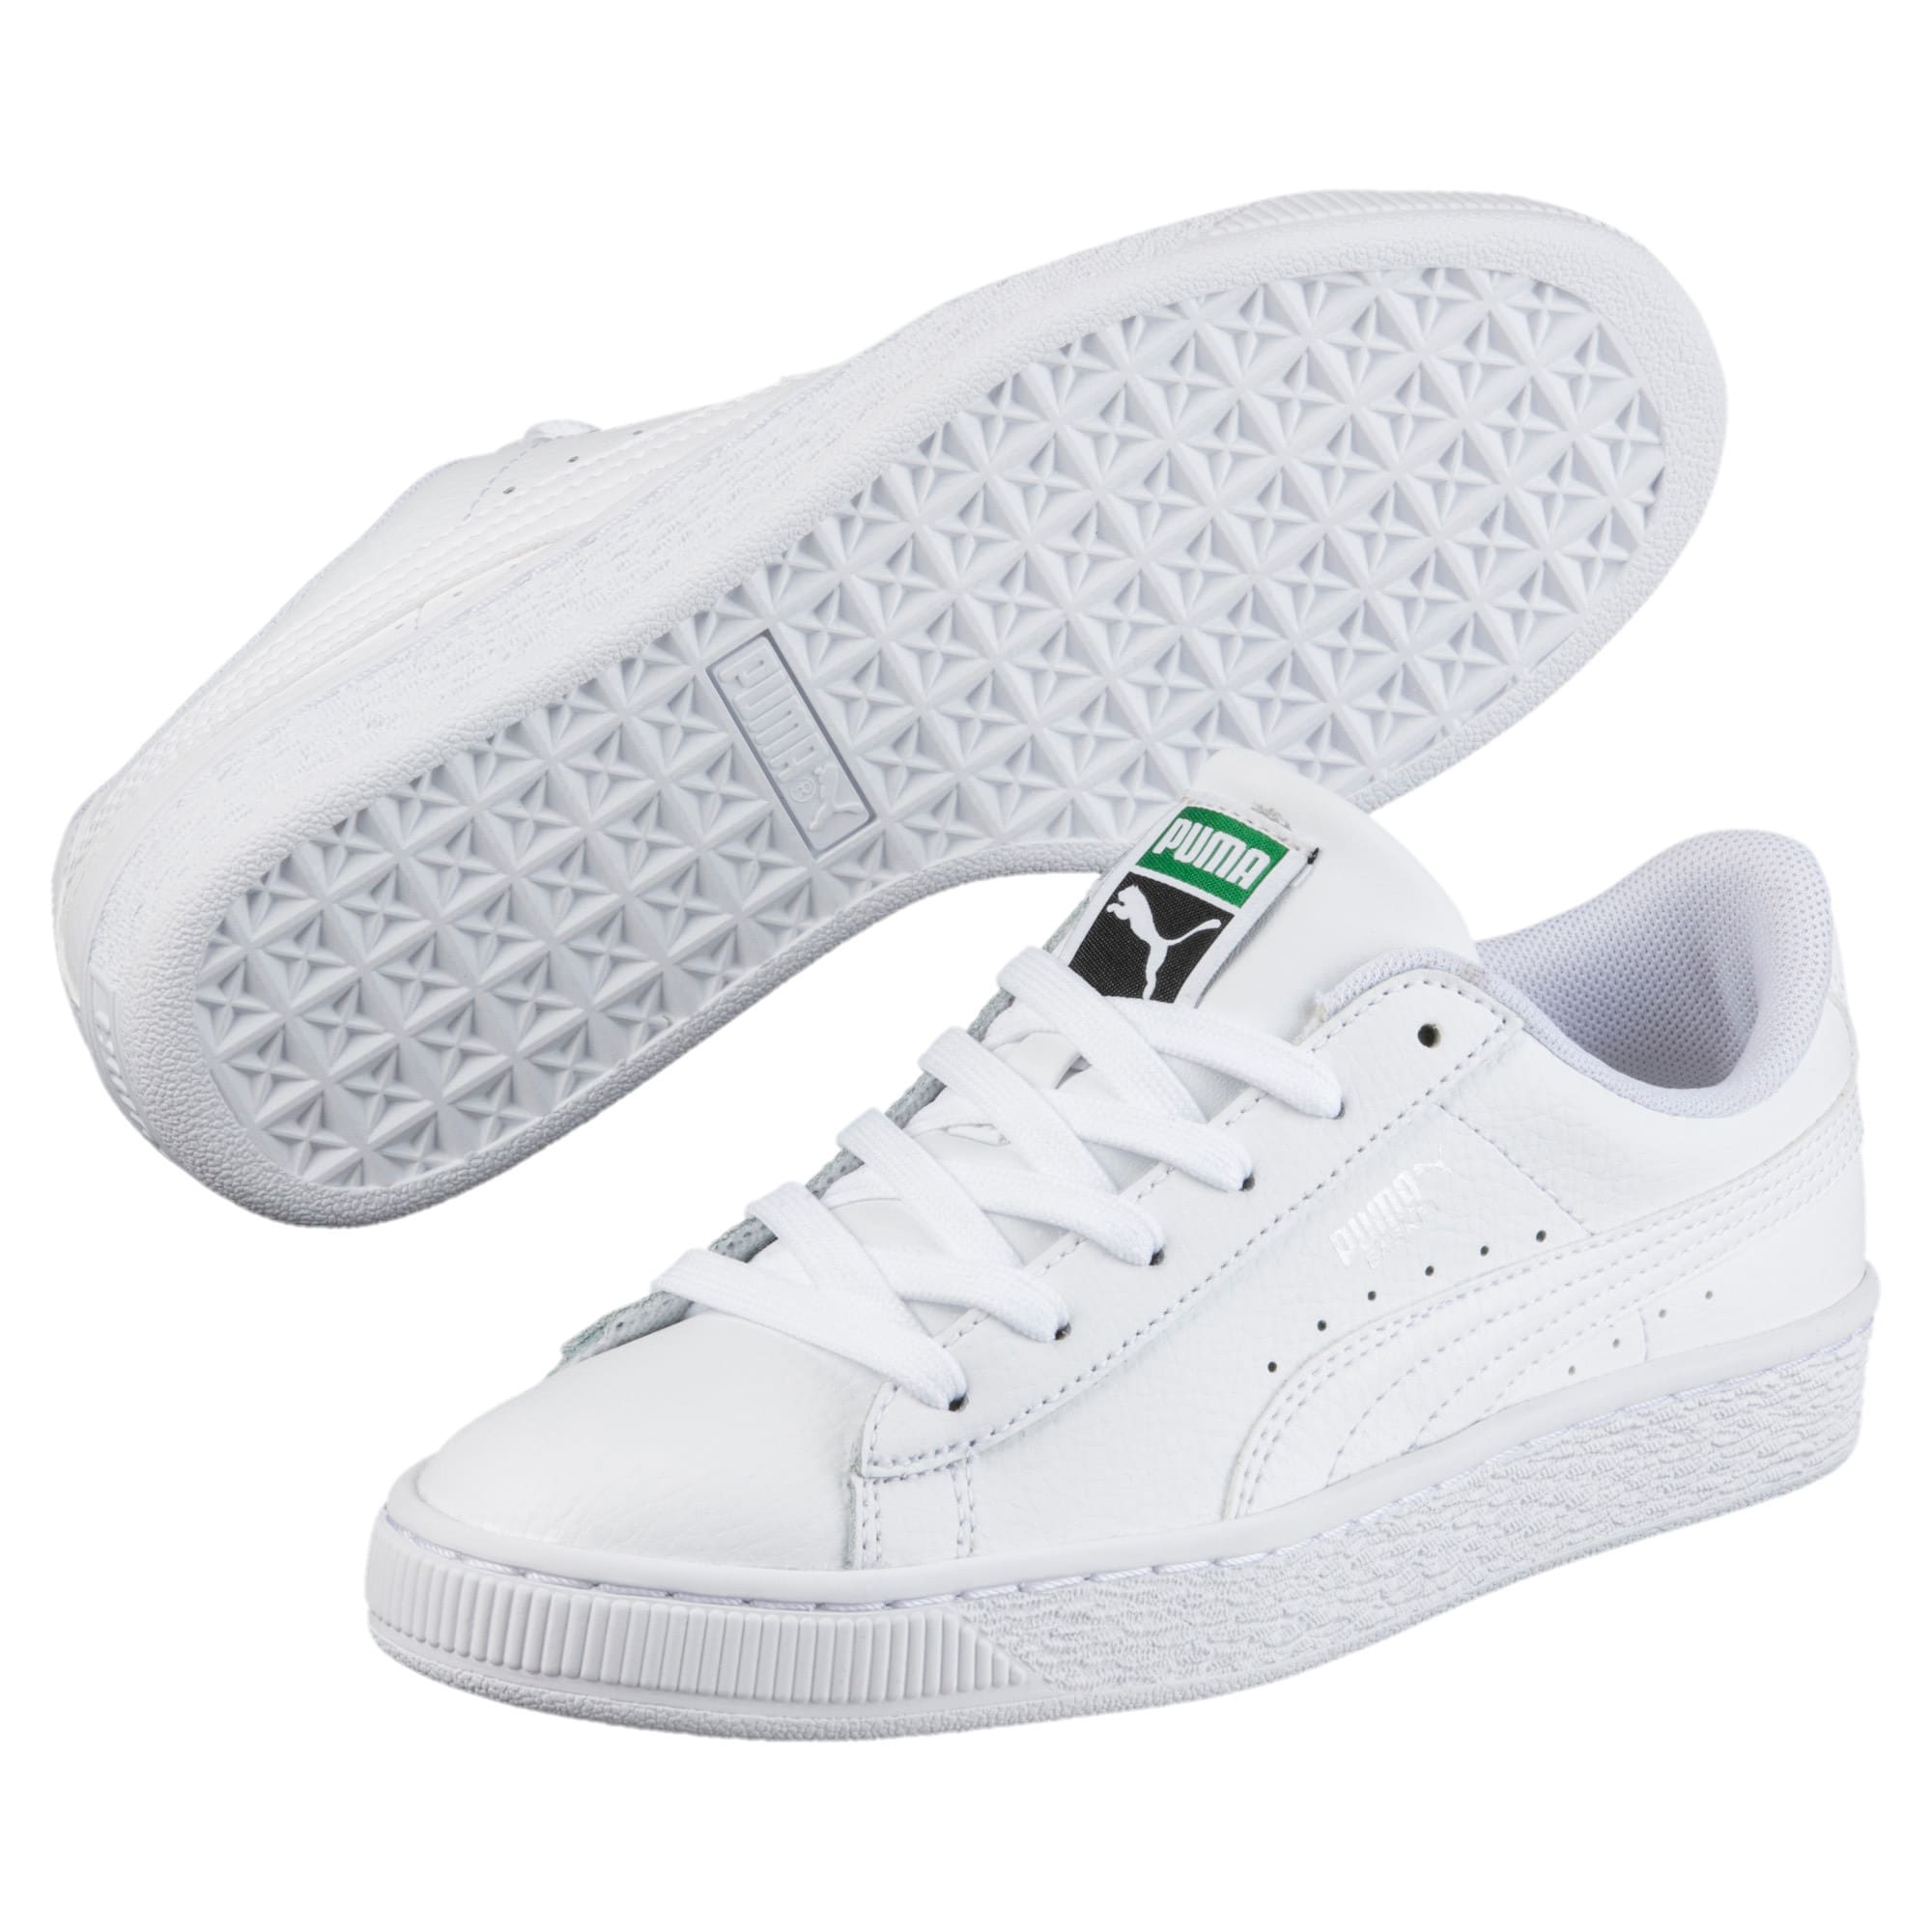 Thumbnail 2 of Basket Classic Sneakers JR, Puma White-Puma White, medium